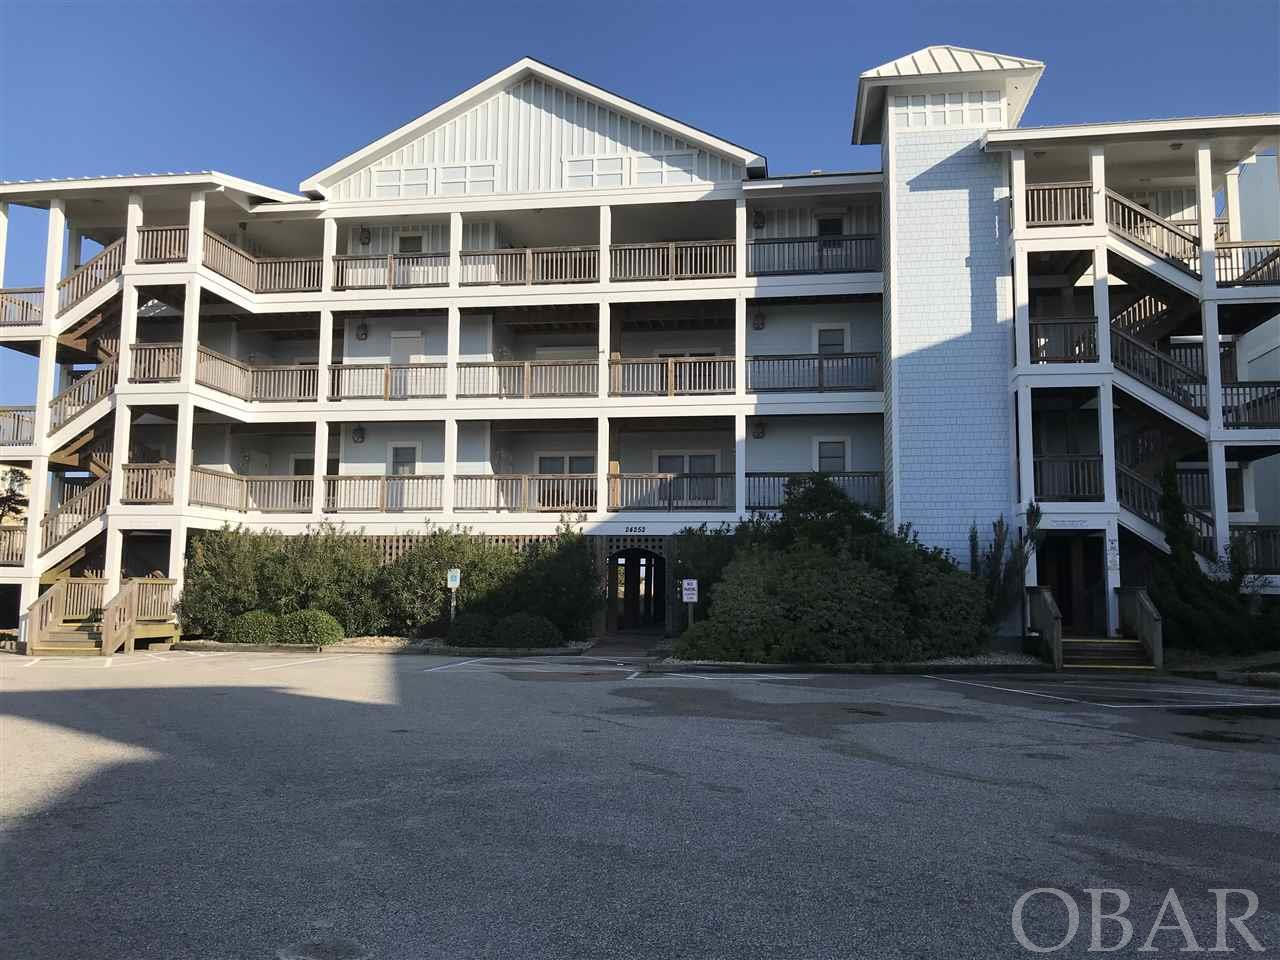 24252 Resort Rodanthe Drive Unit 3A, Rodanthe, NC 27968